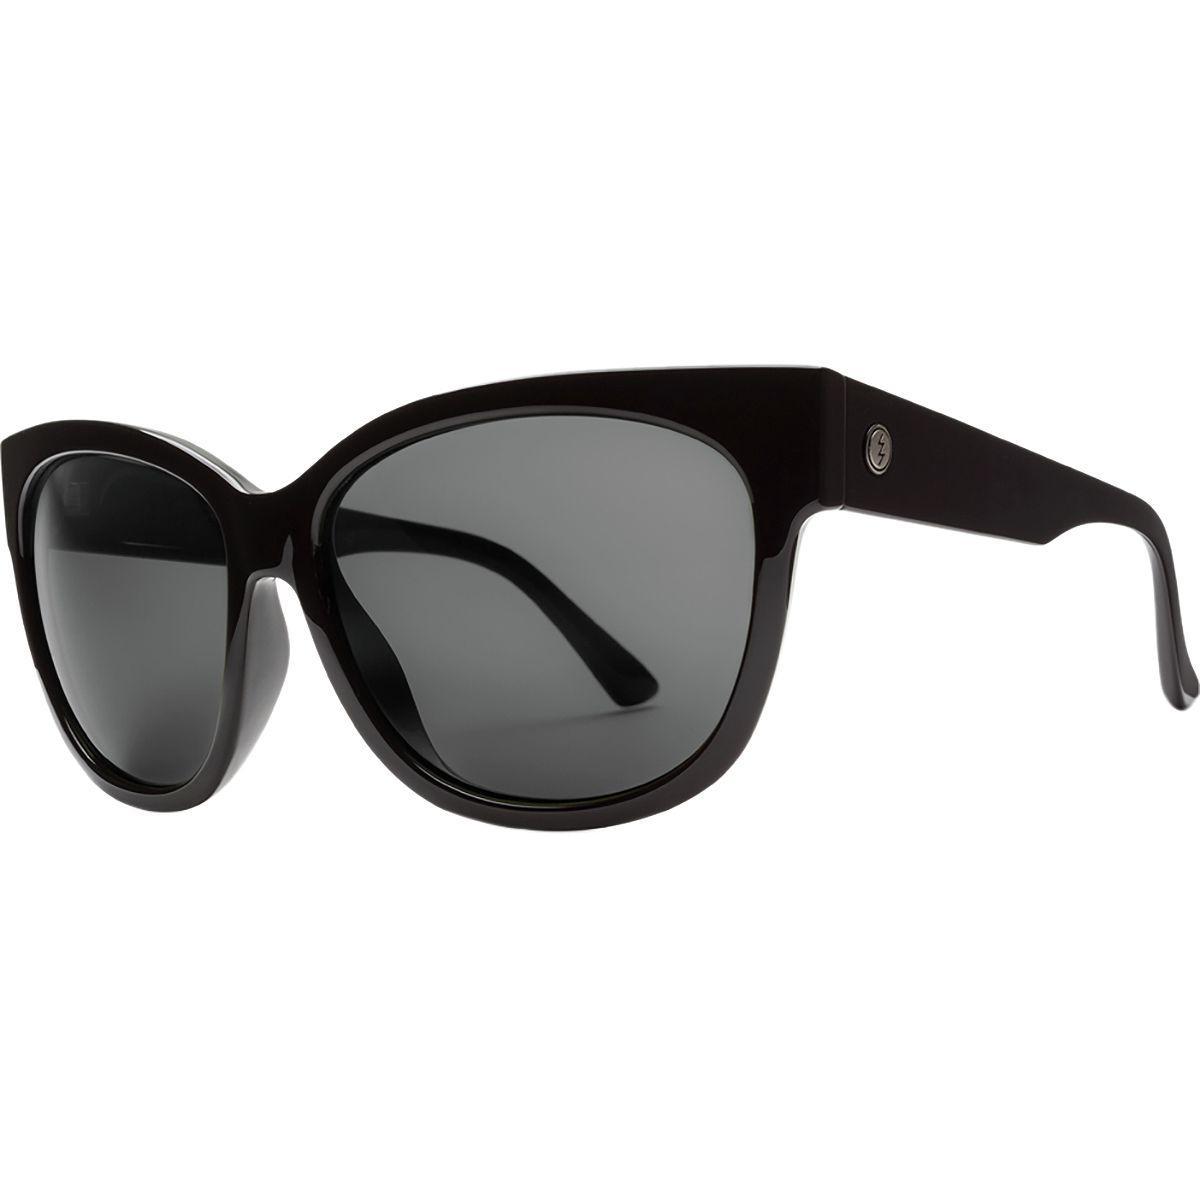 ec90911122f Lyst - Electric Danger Cat Polarized Sunglasses in Black